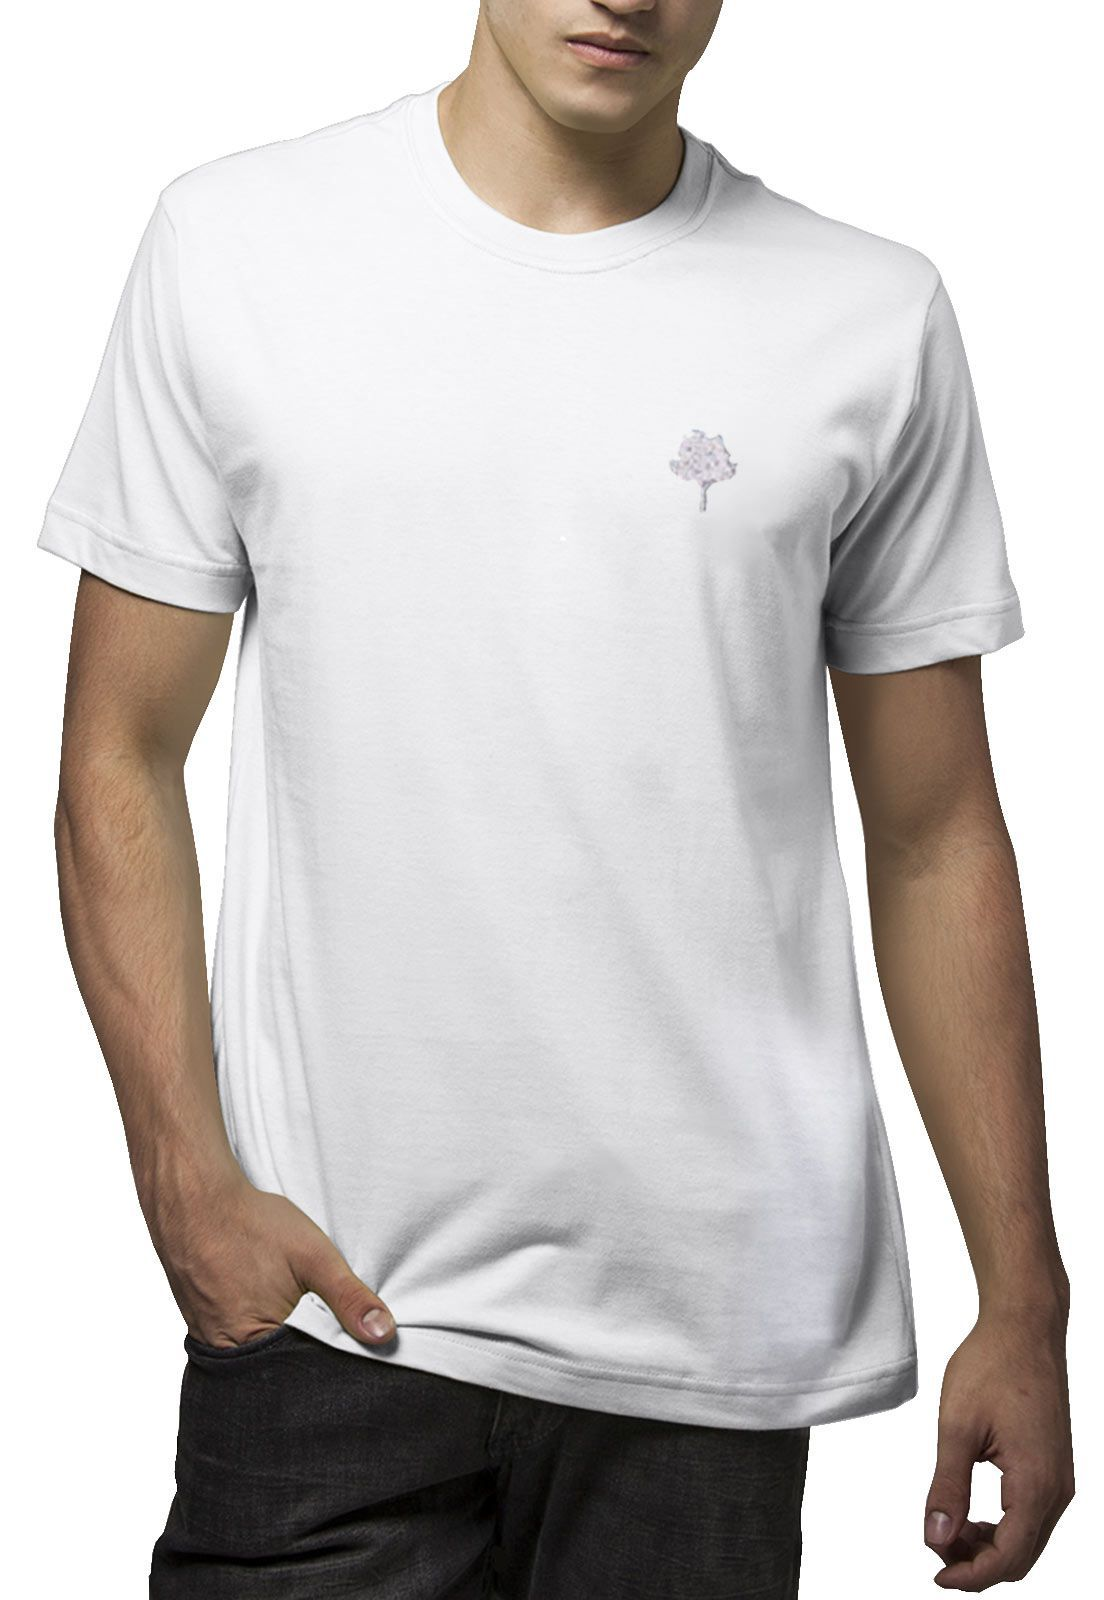 Camiseta Amazônia Bromélia na Floresta - Branco